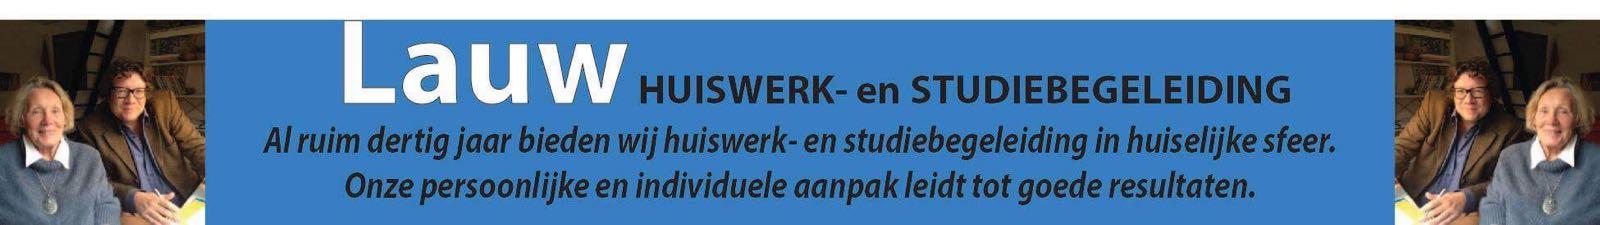 Bart Lauw studiebegeleiding